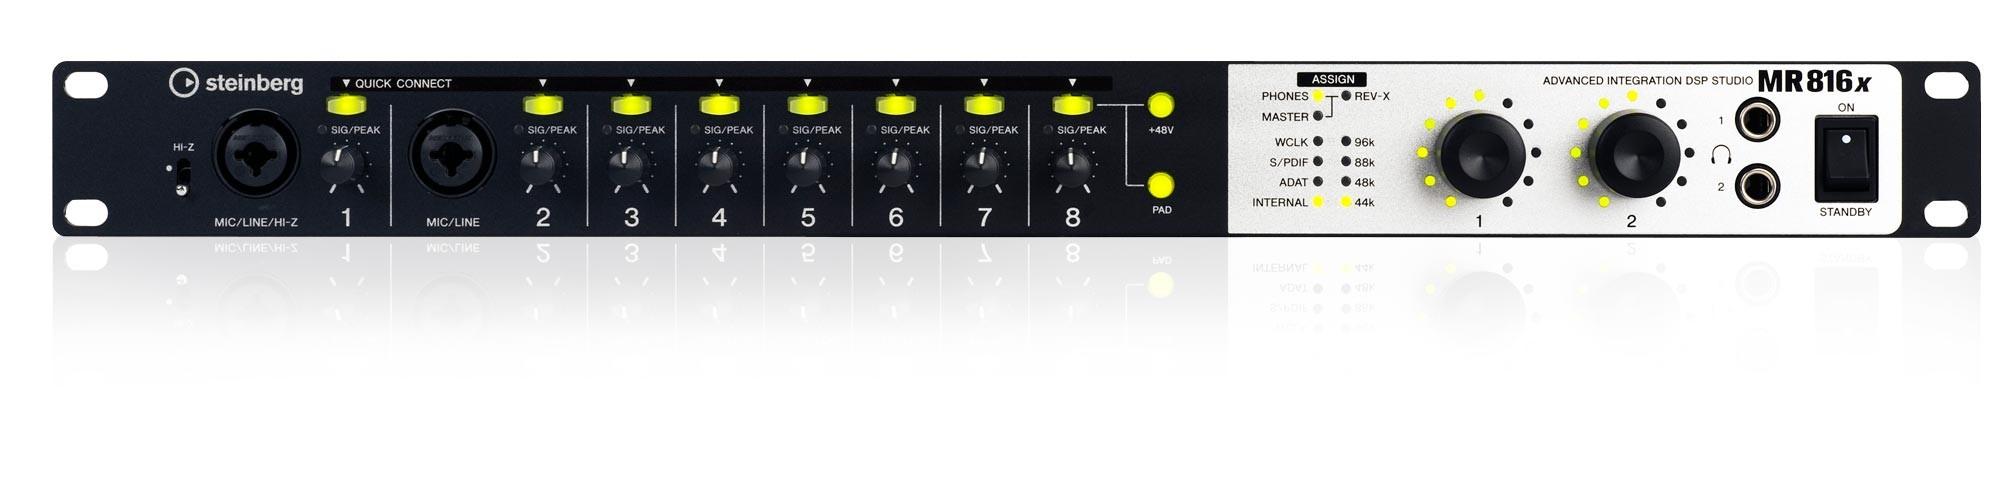 MR816 X Advanced Integration DSP Studio